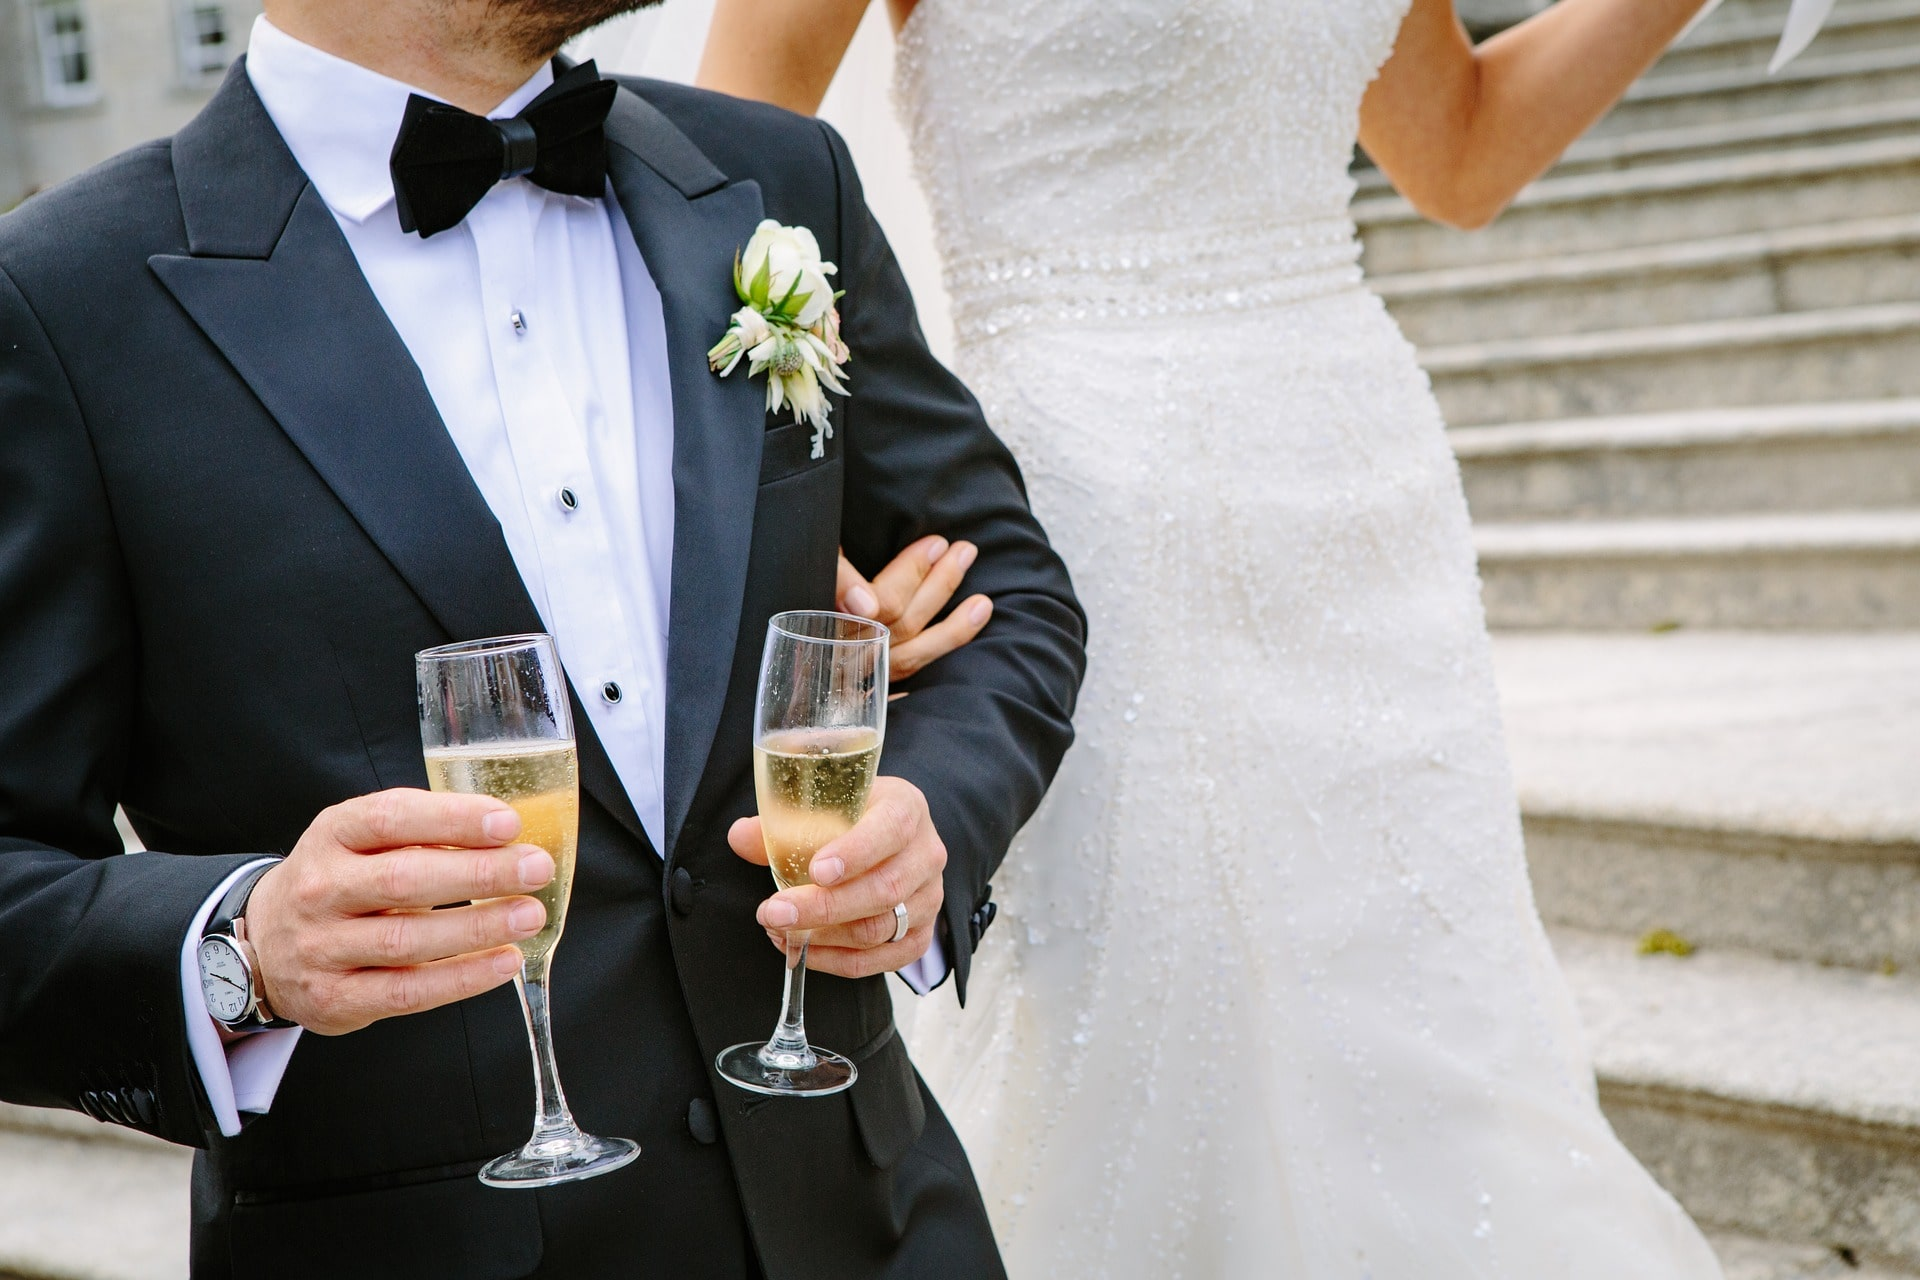 wedding day mistakes